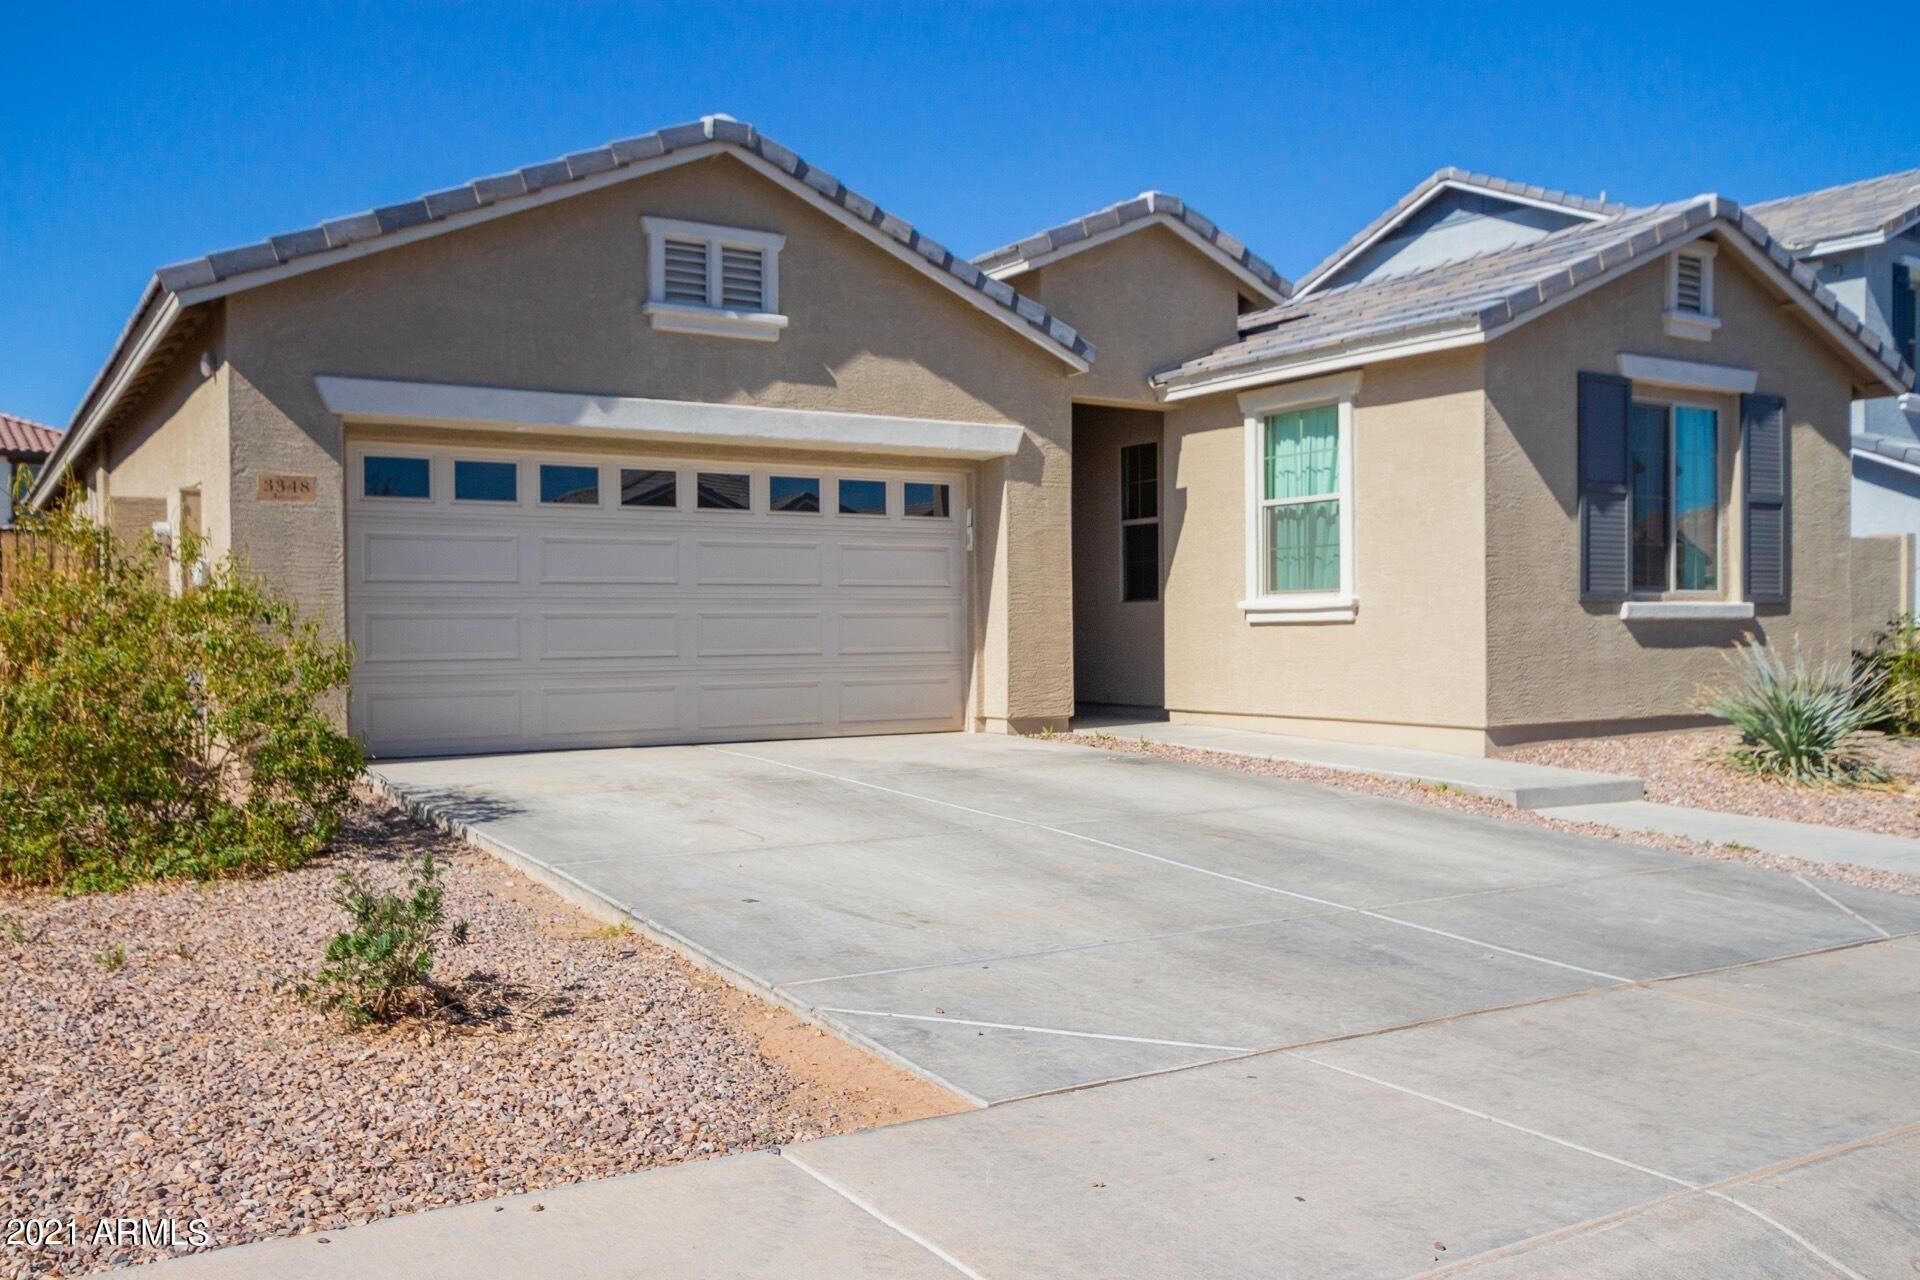 Photo of 3348 N ARCO --, Mesa, AZ 85213 (MLS # 6203592)